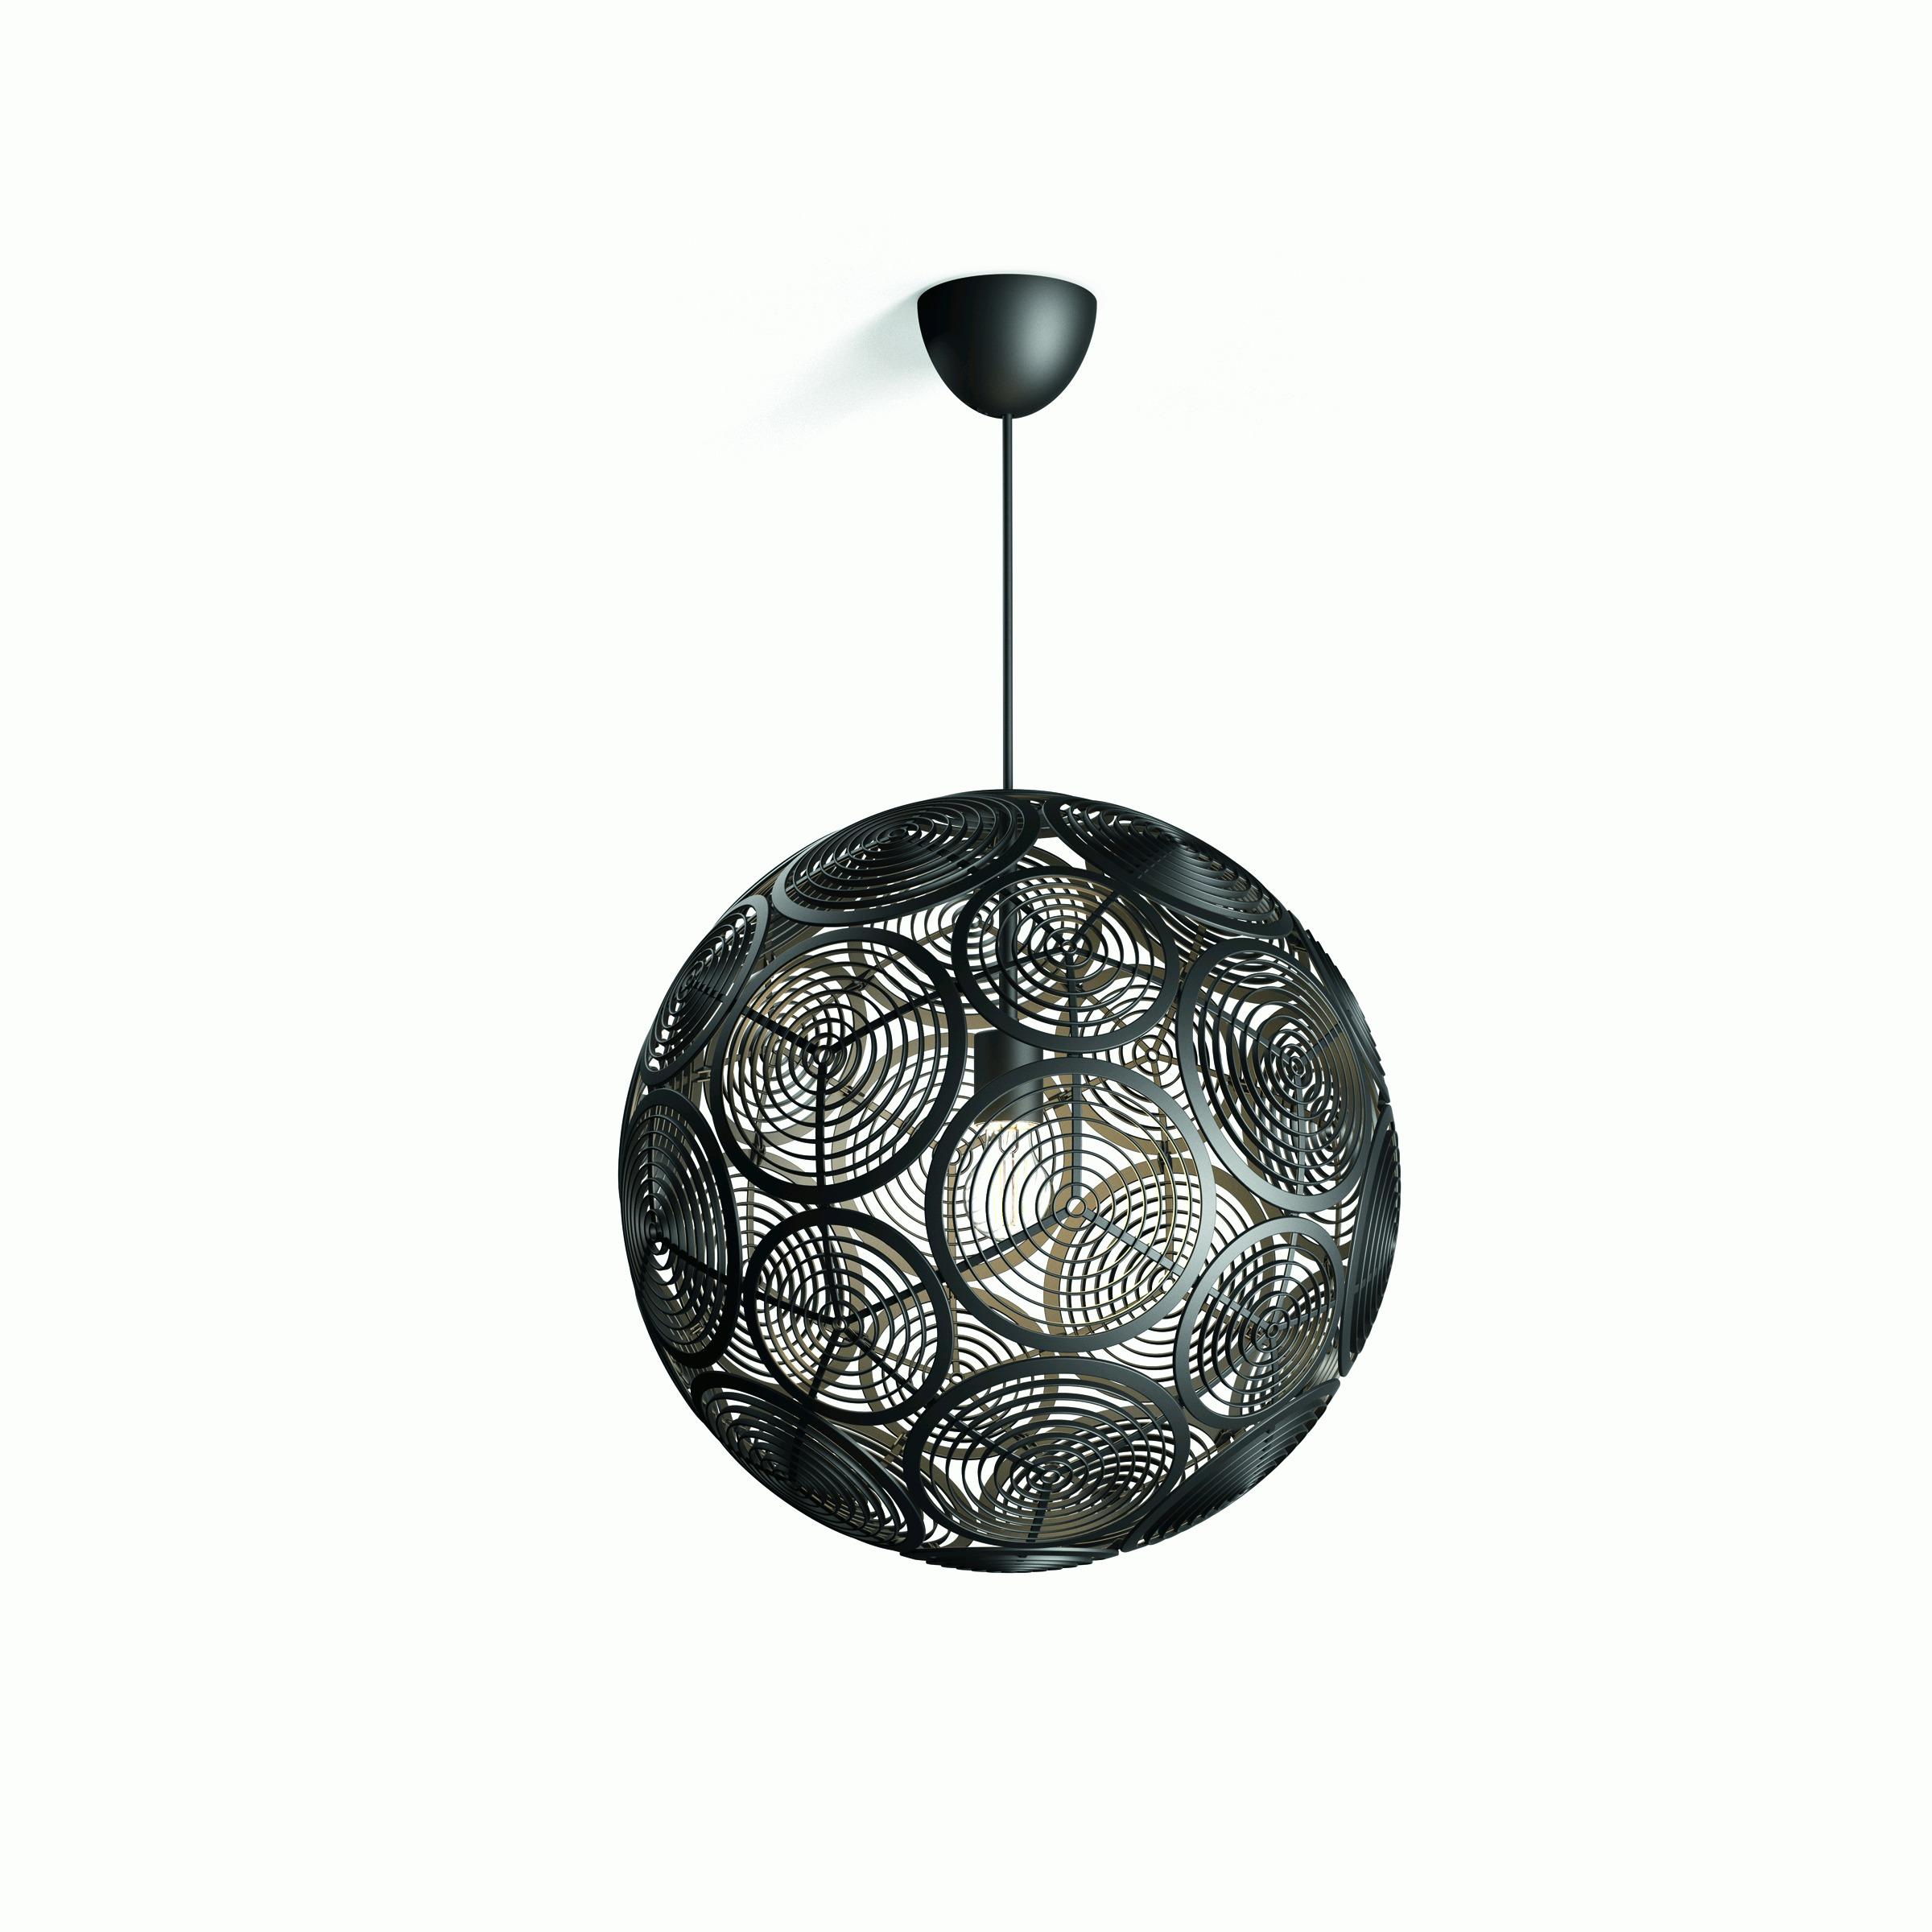 Philips hanglamp Ring zwart